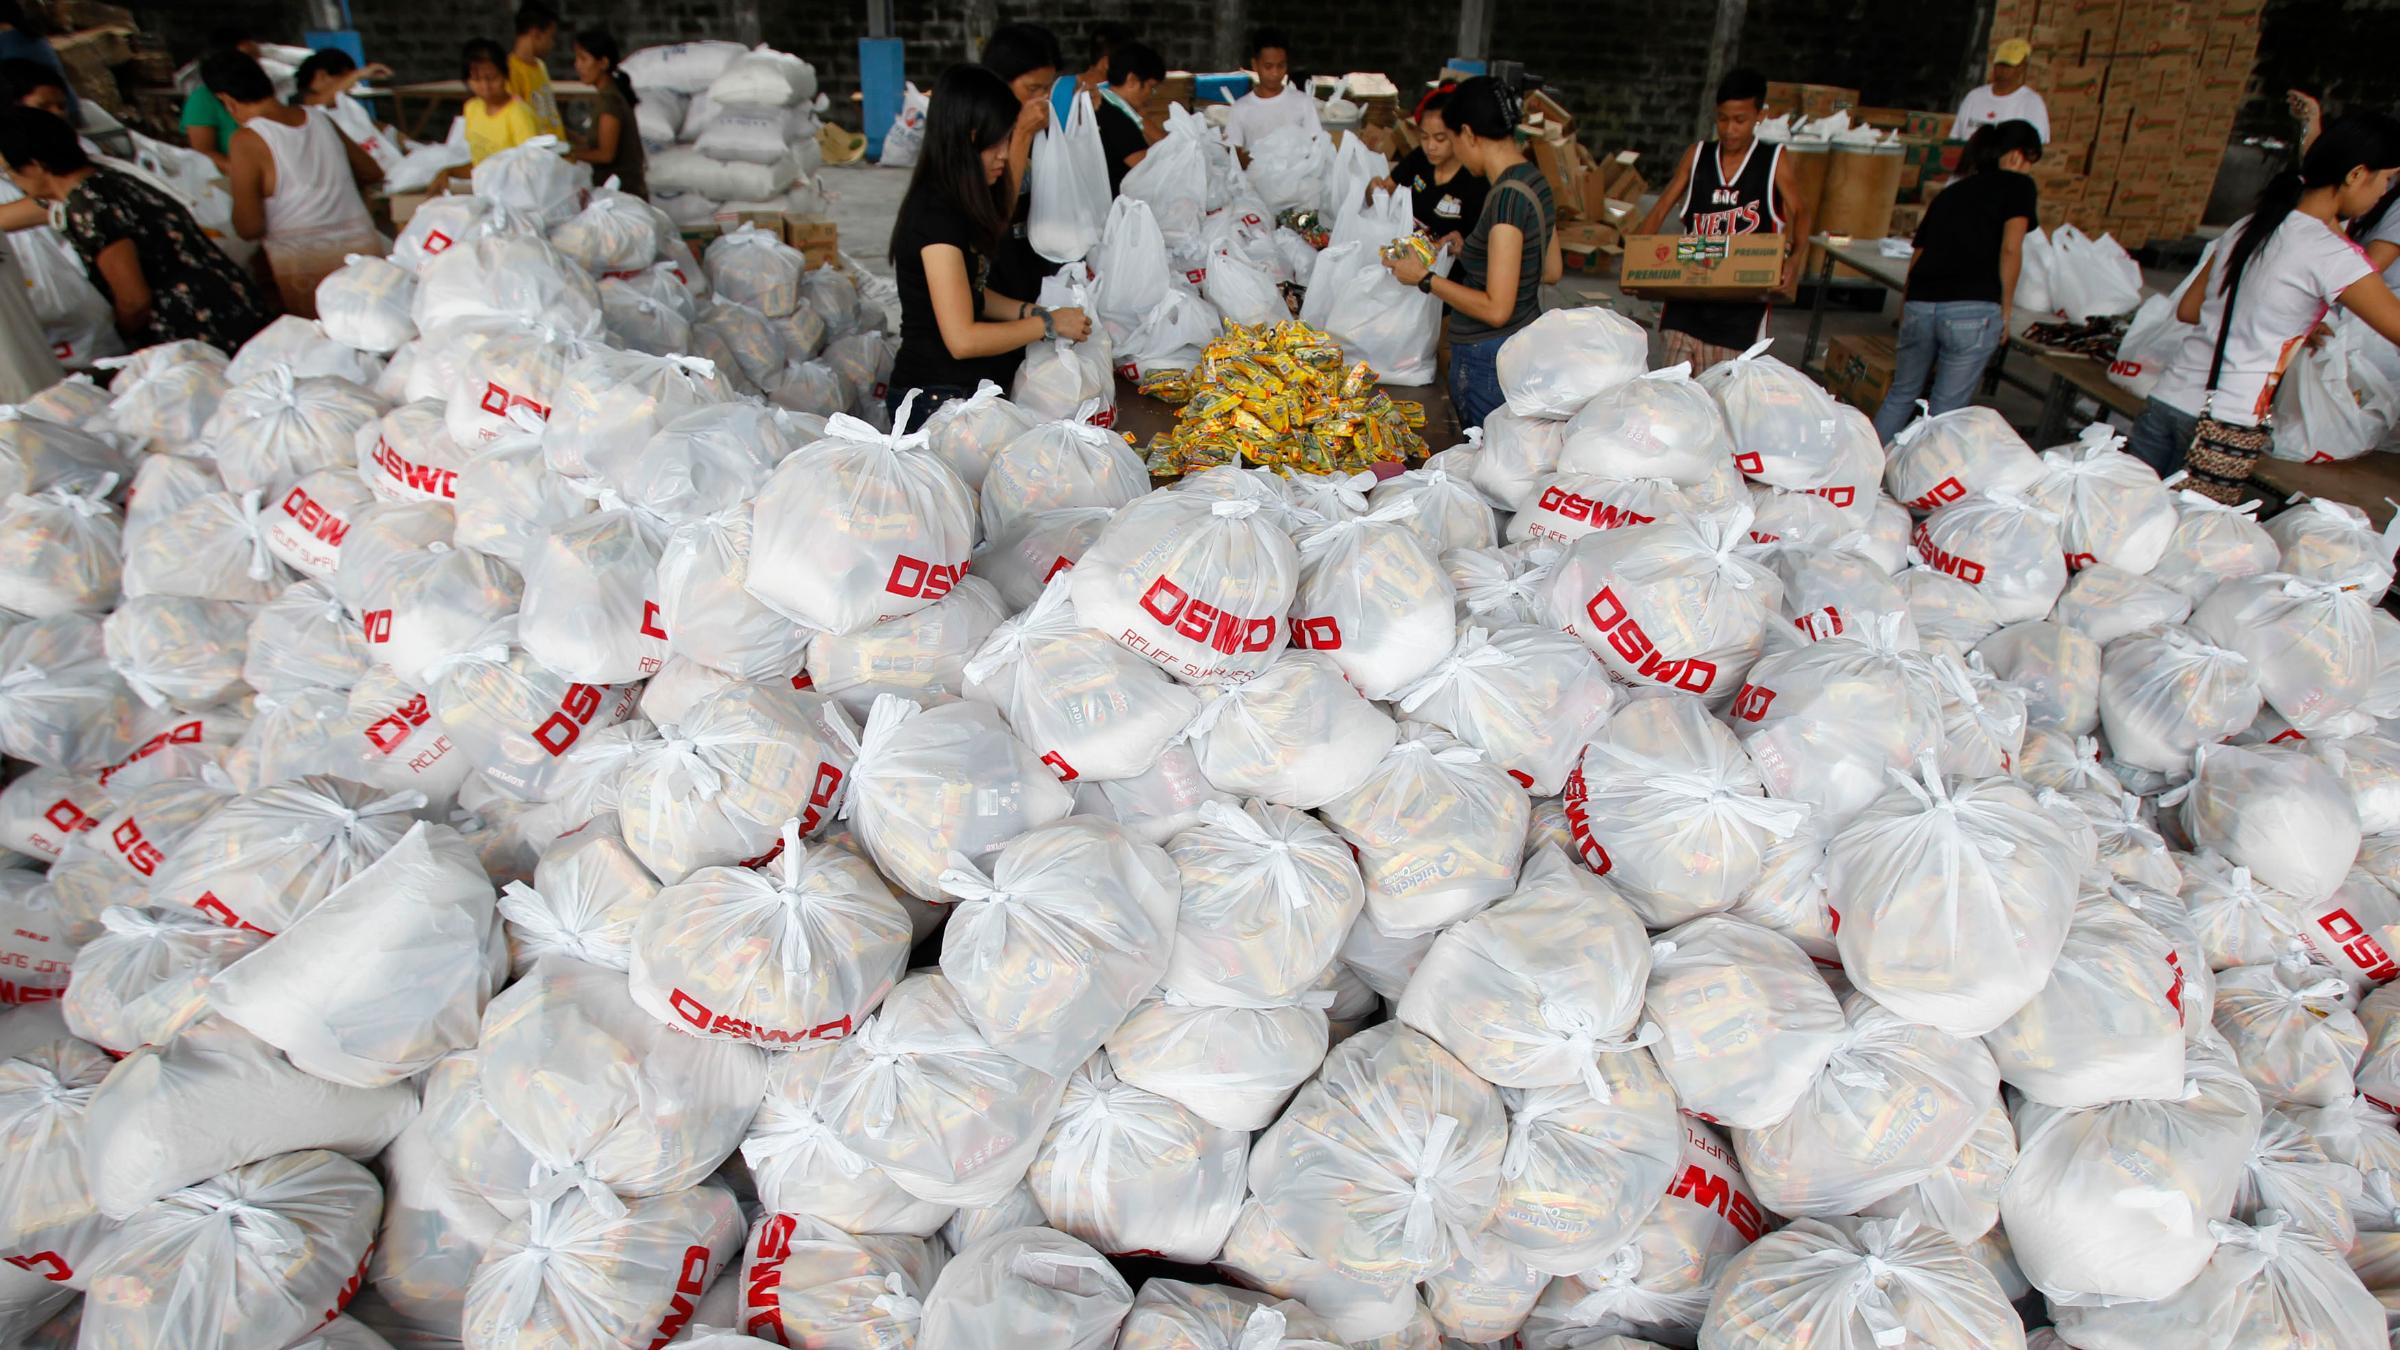 Philippines food relief